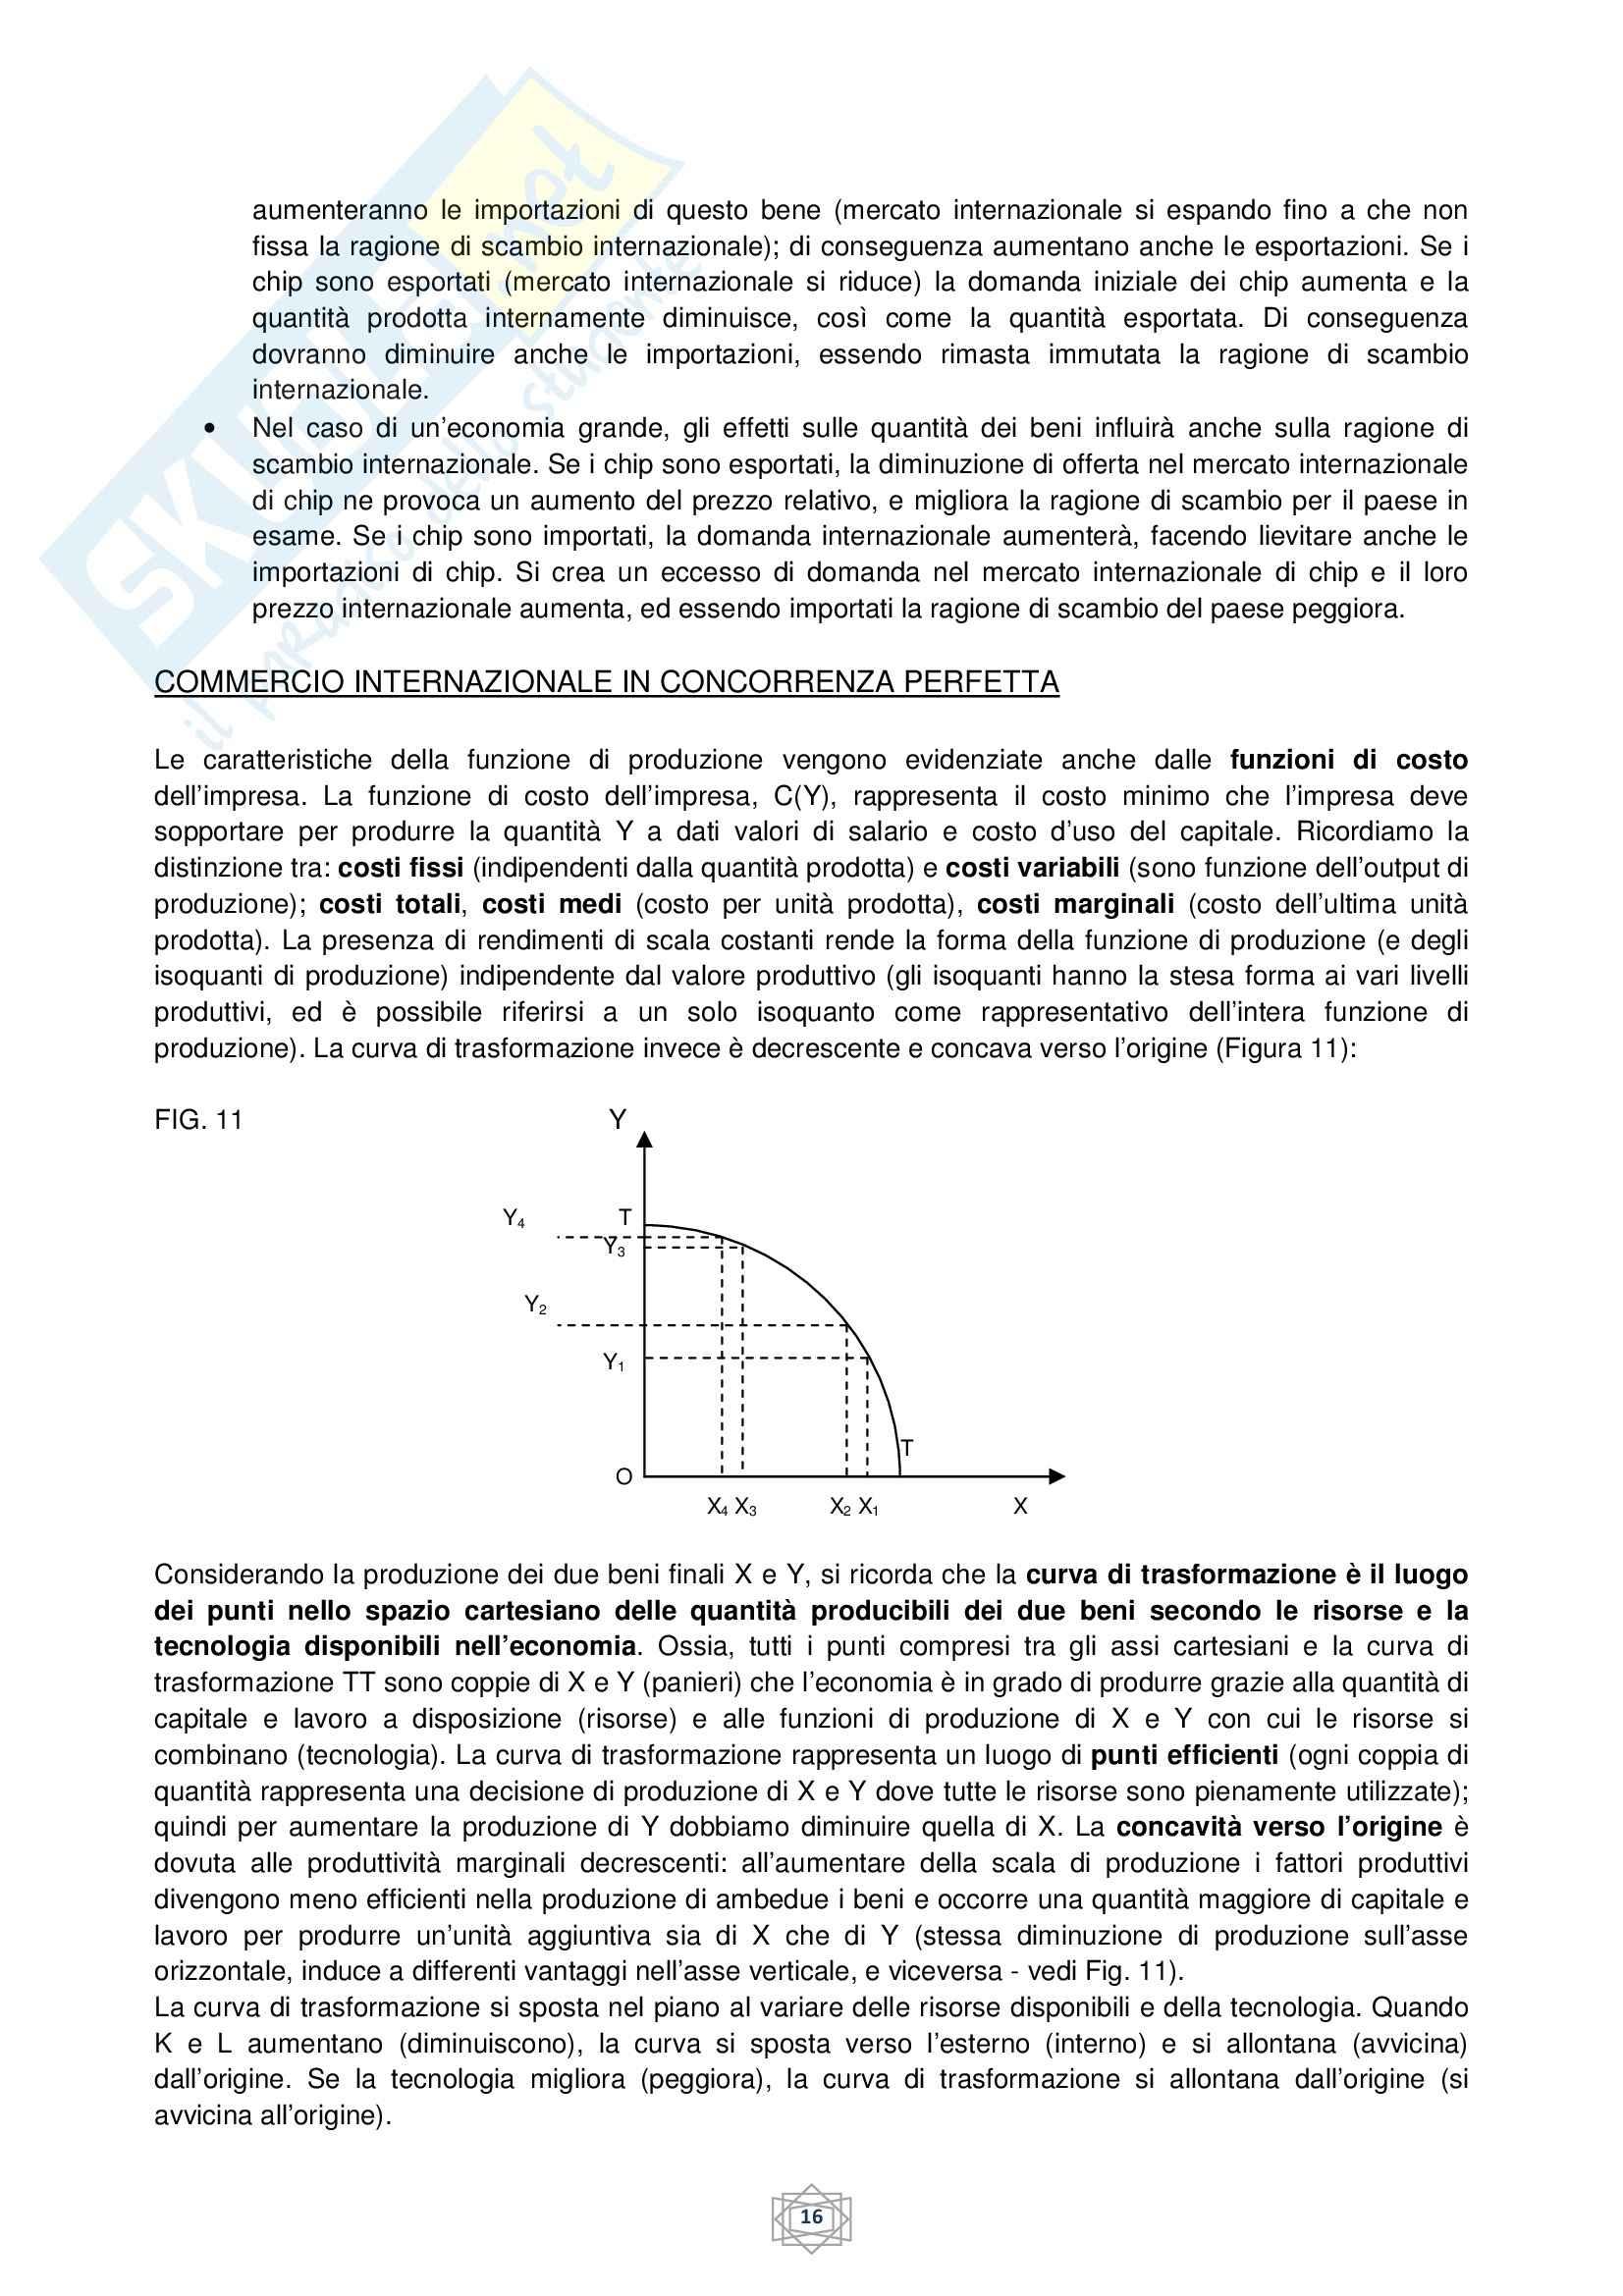 Riassunto esame Economia internazionale, prof. Atzeni, libro consigliato Economia internazionale, di De Arcangelis Pag. 16